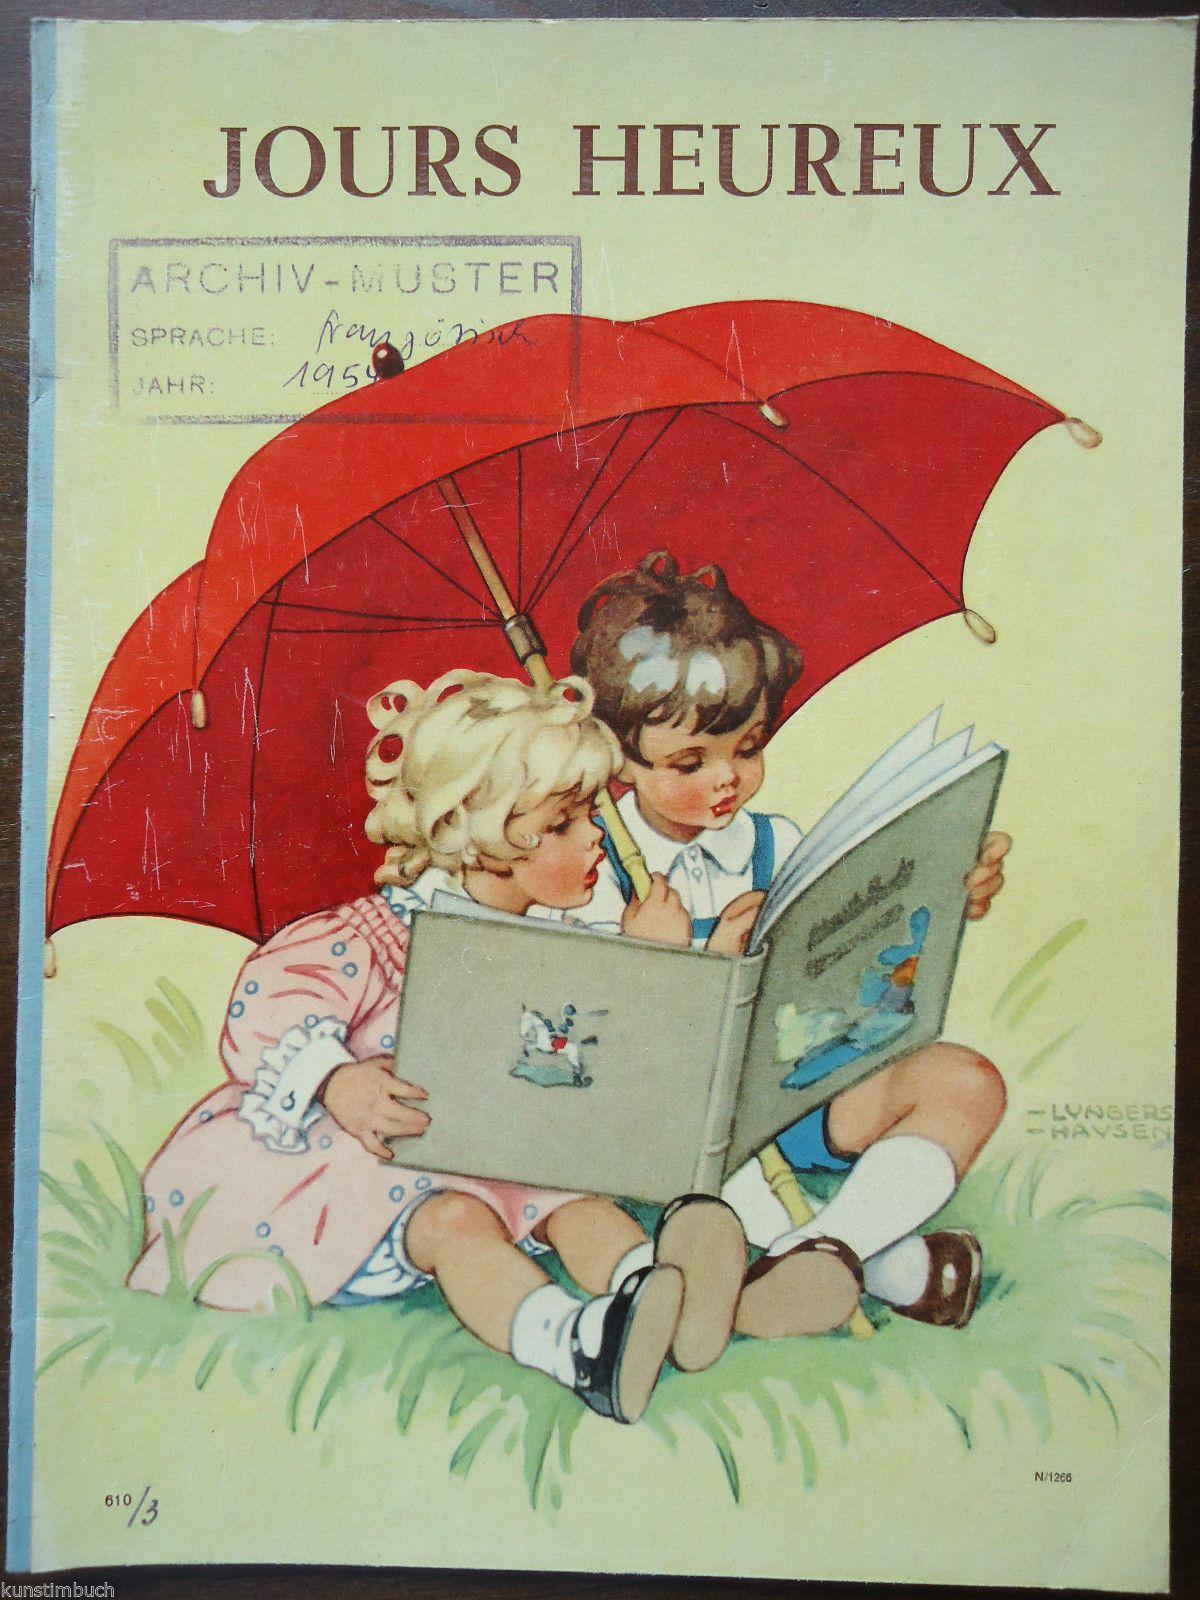 http://i.ebayimg.com/t/Bilderbuch-Ilse-Wende-Lungershausen-Koli-Kolnberger-Jours-Heureux-EA-1954-/00/s/MTYwMFgxMjAw/z/dWoAAMXQhpdR0r54/$(KGr...